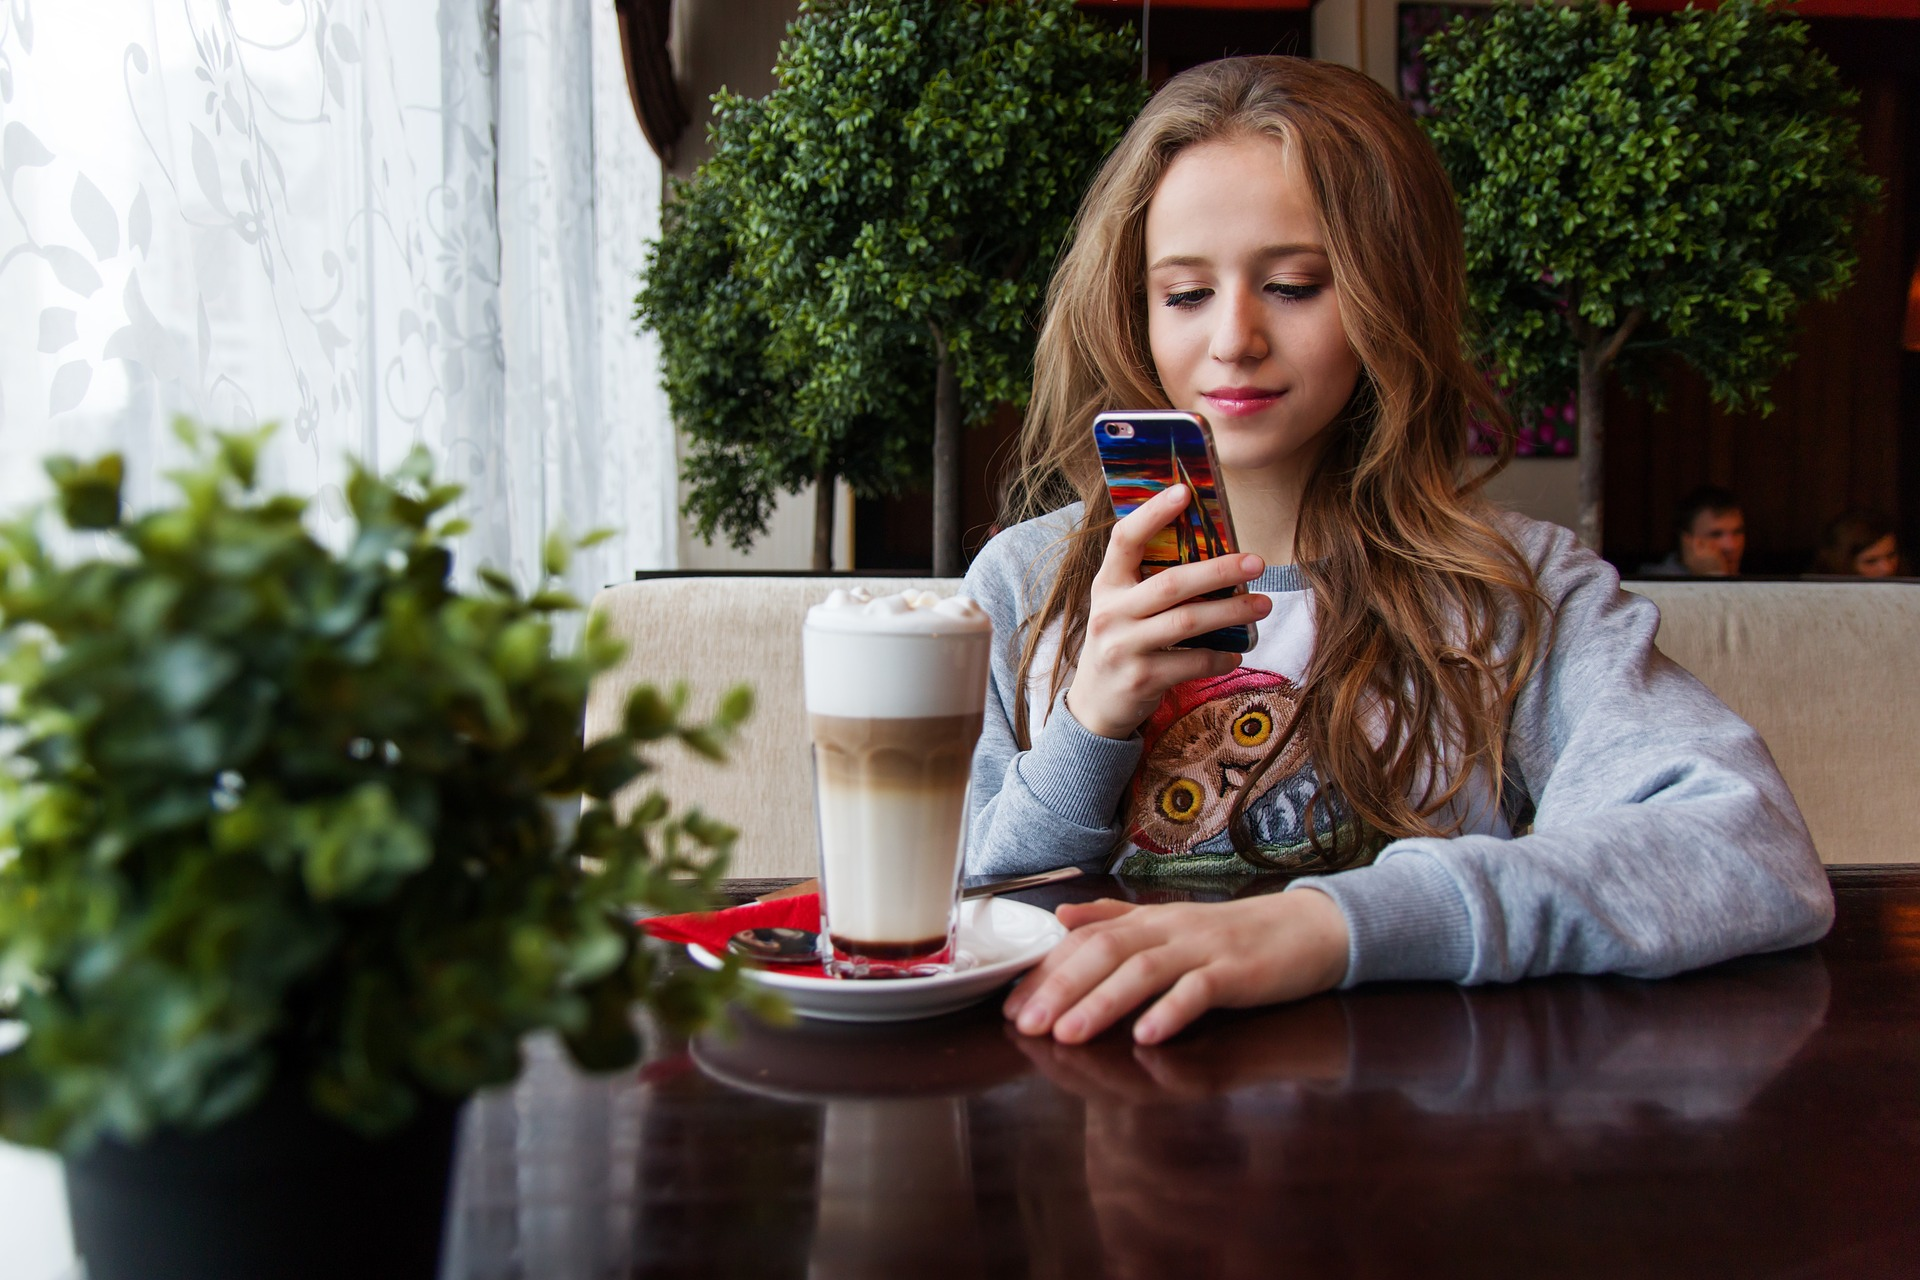 influencer tomando una foto del café